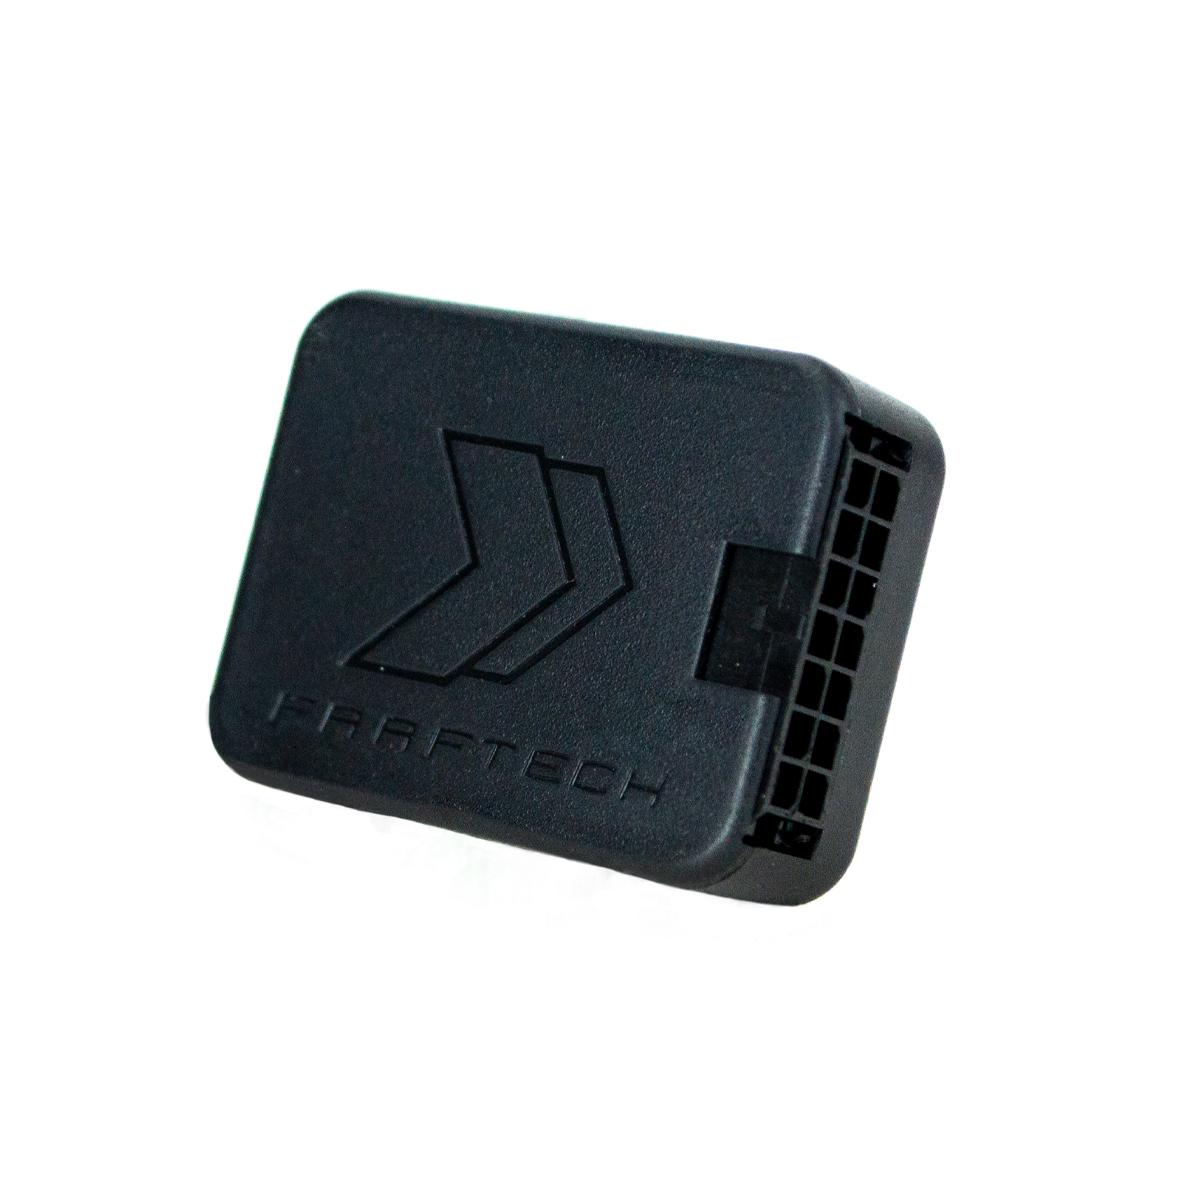 Chip de Pedal Shiftpower Para Toyota Hilux